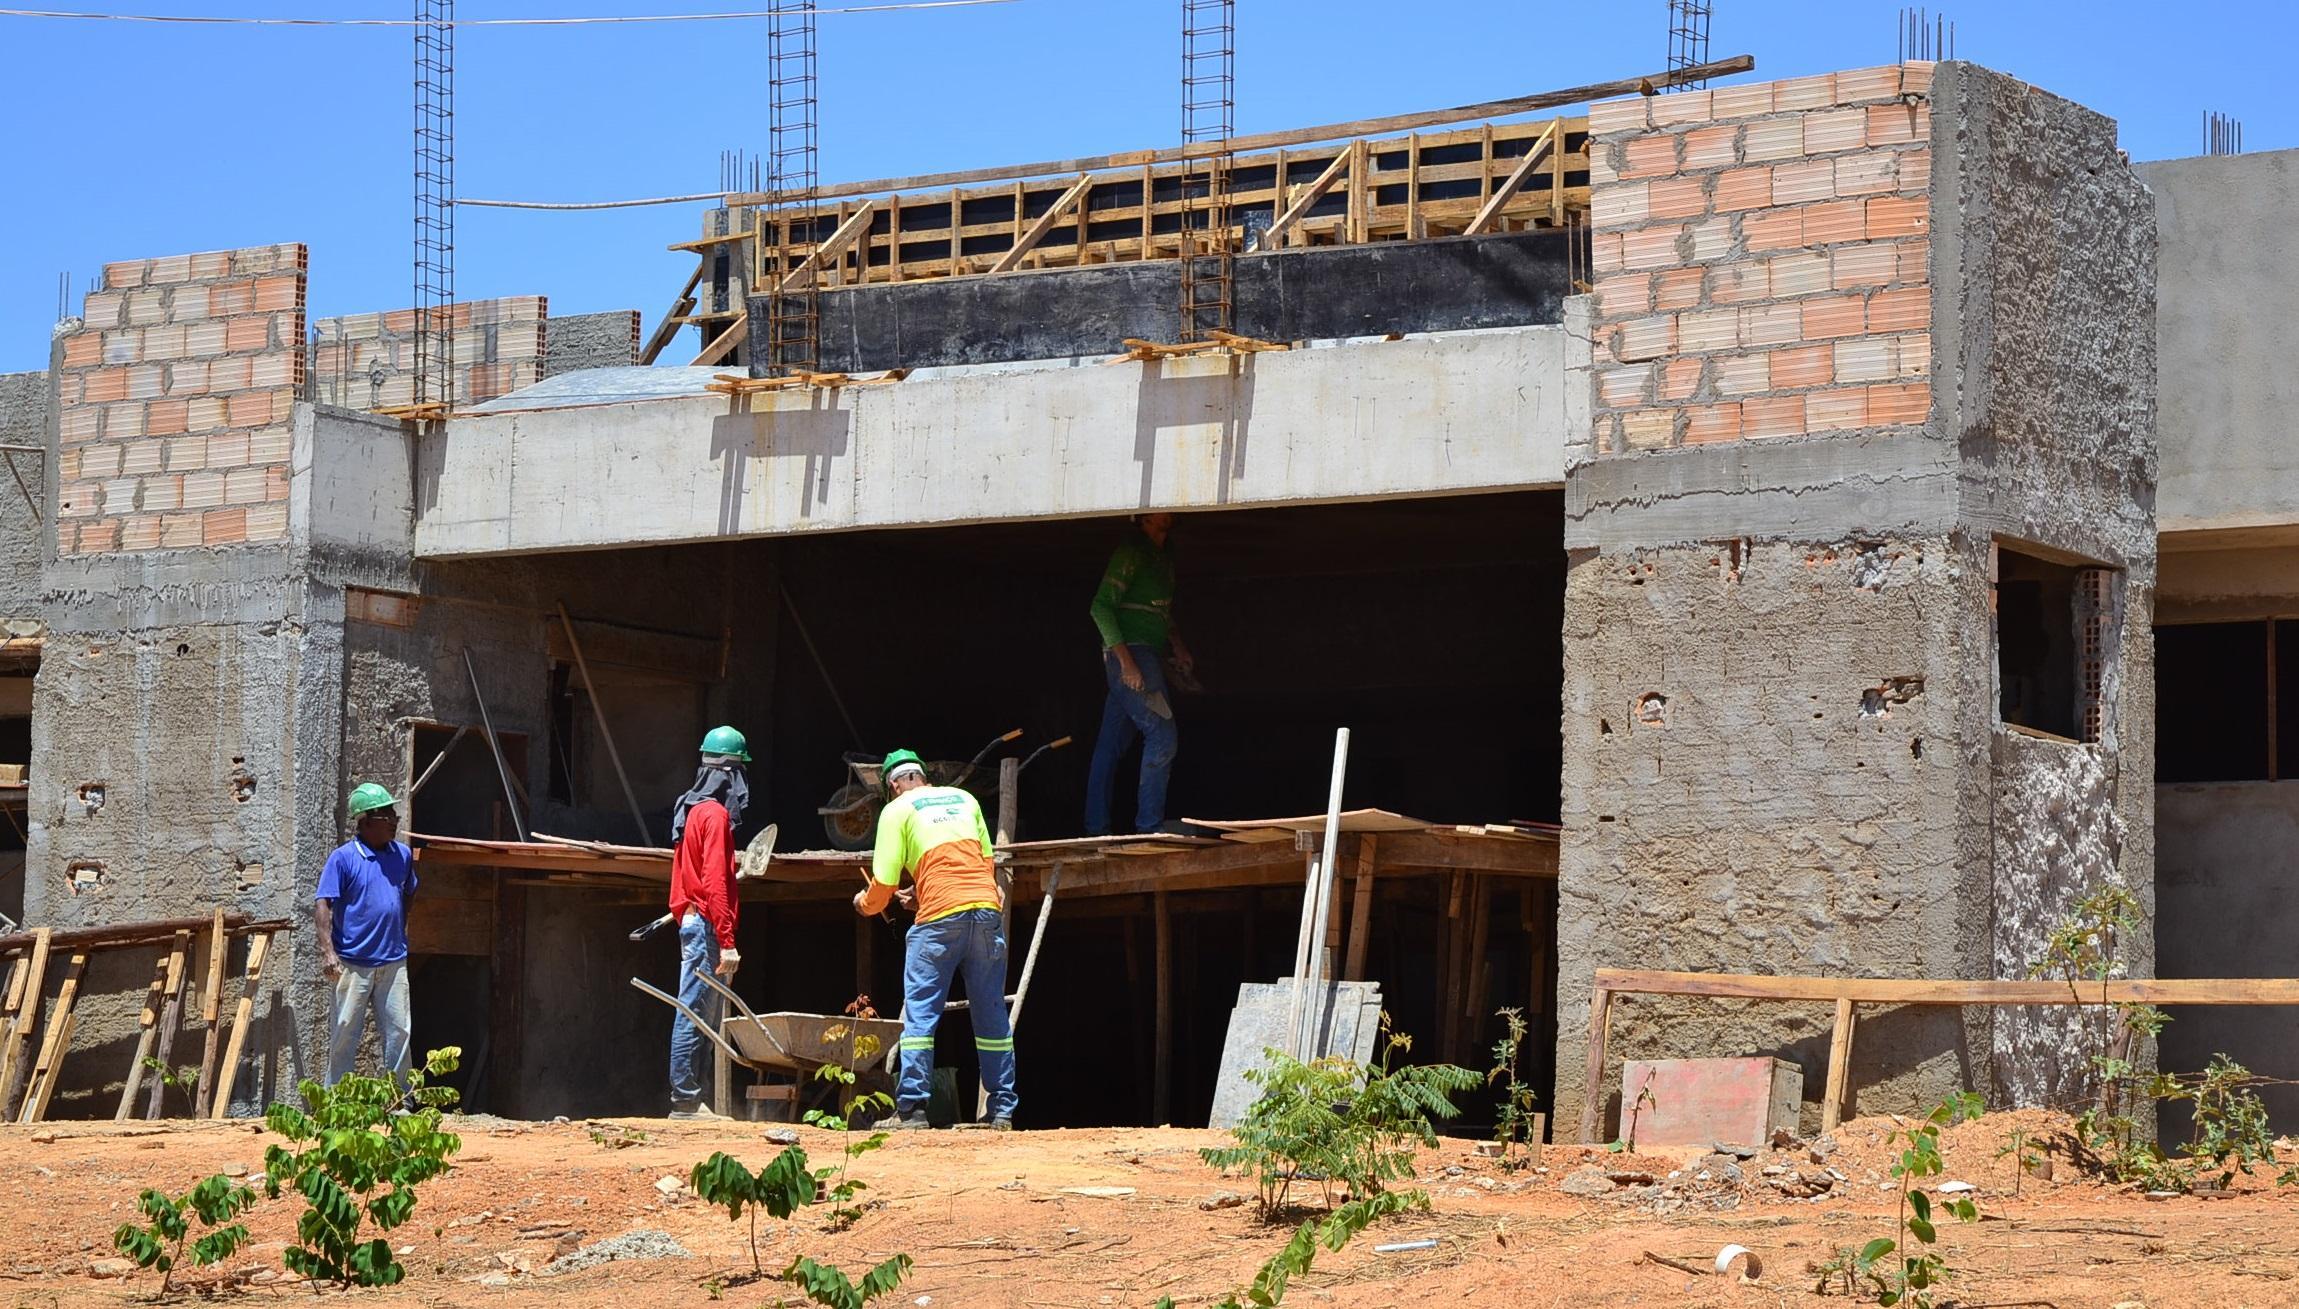 Imagem de destaque COMPLEXO DE SAÚDE MENTAL - Prefeito visita obras nos bairros Planalto e Recanto das Águas